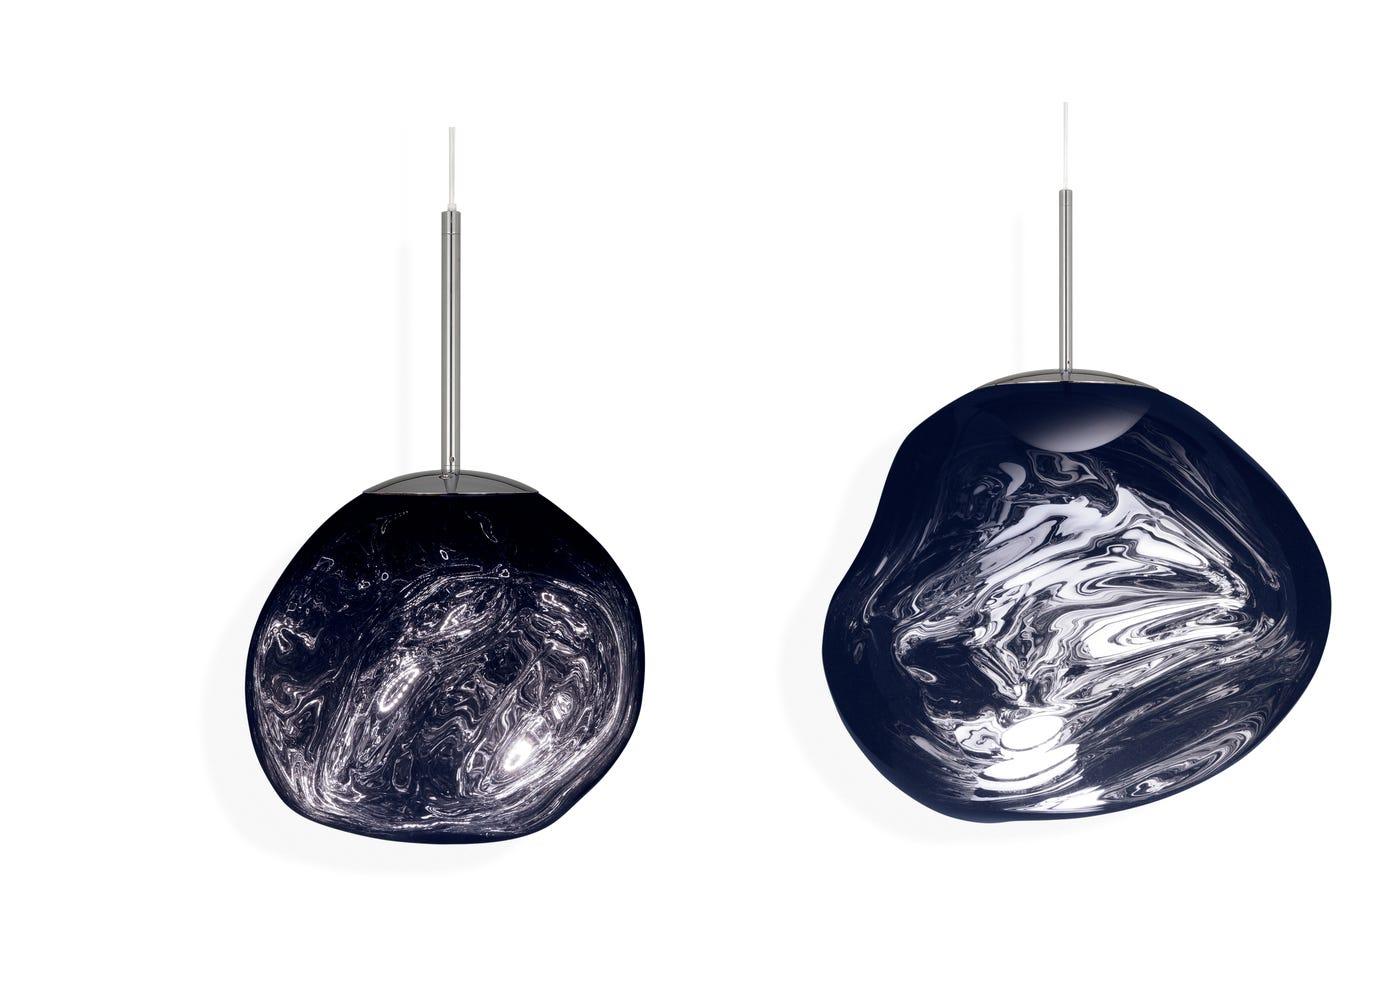 From left to right: Smoke mini LED light on, Smoke standard LED light on